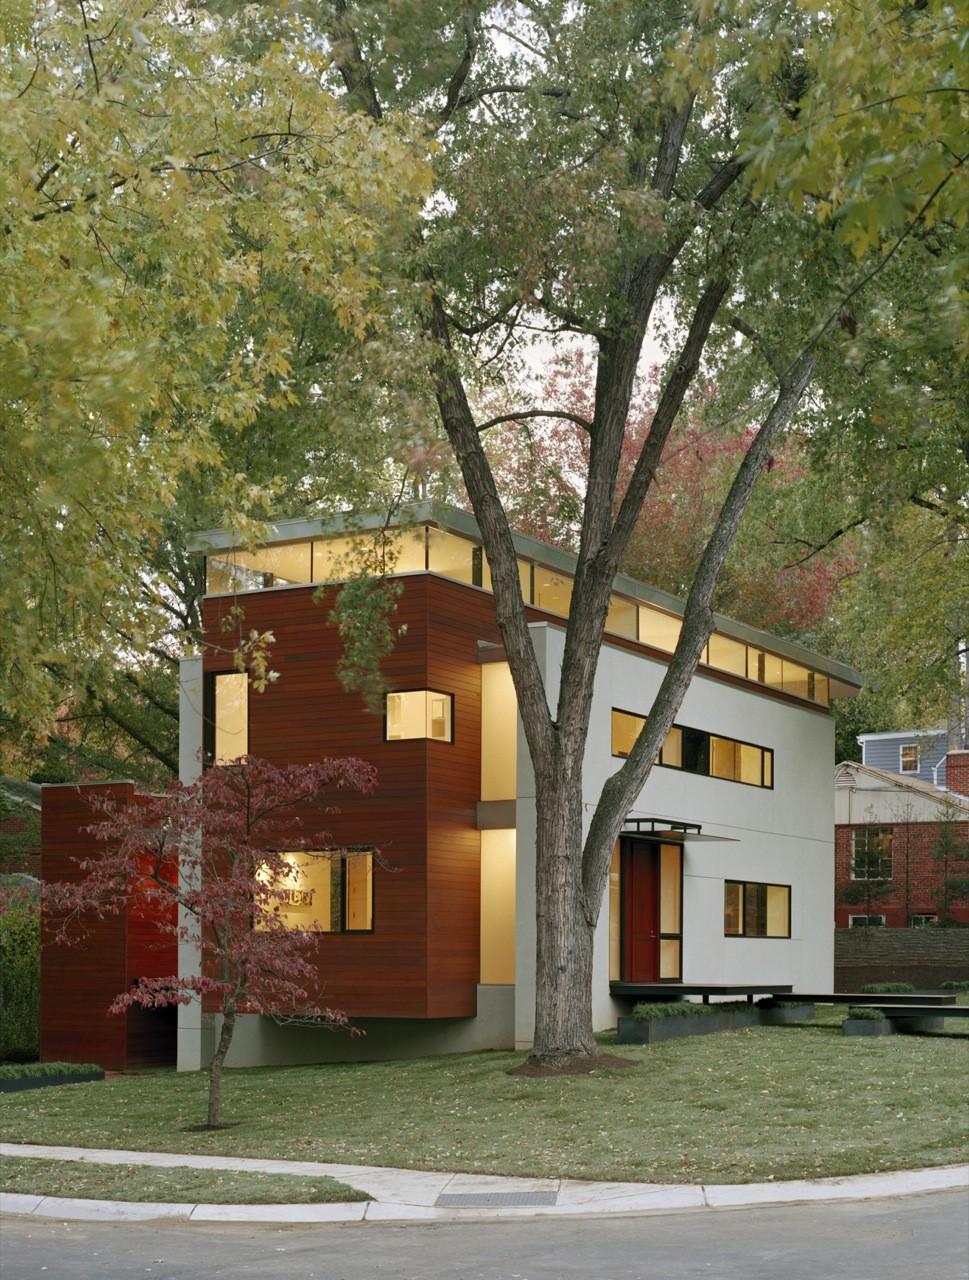 gallery of matryoshka house david jameson architect 6